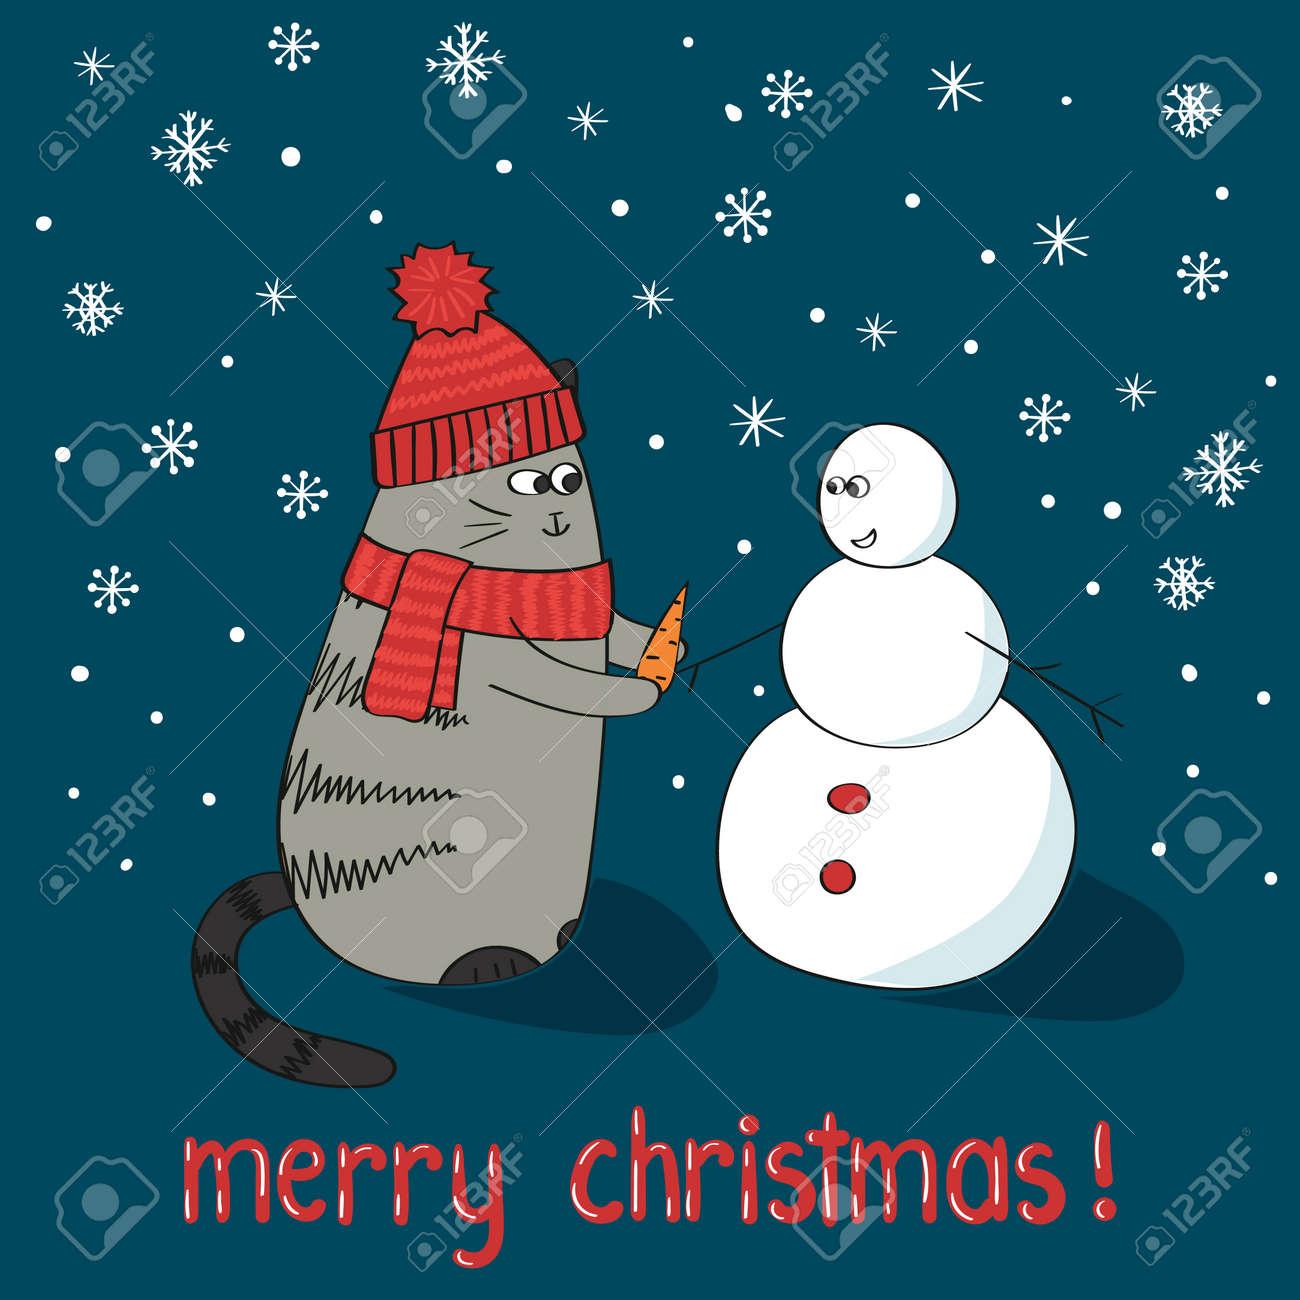 Merry Christmas Card Template Cute Cartoon Cat And Snowman